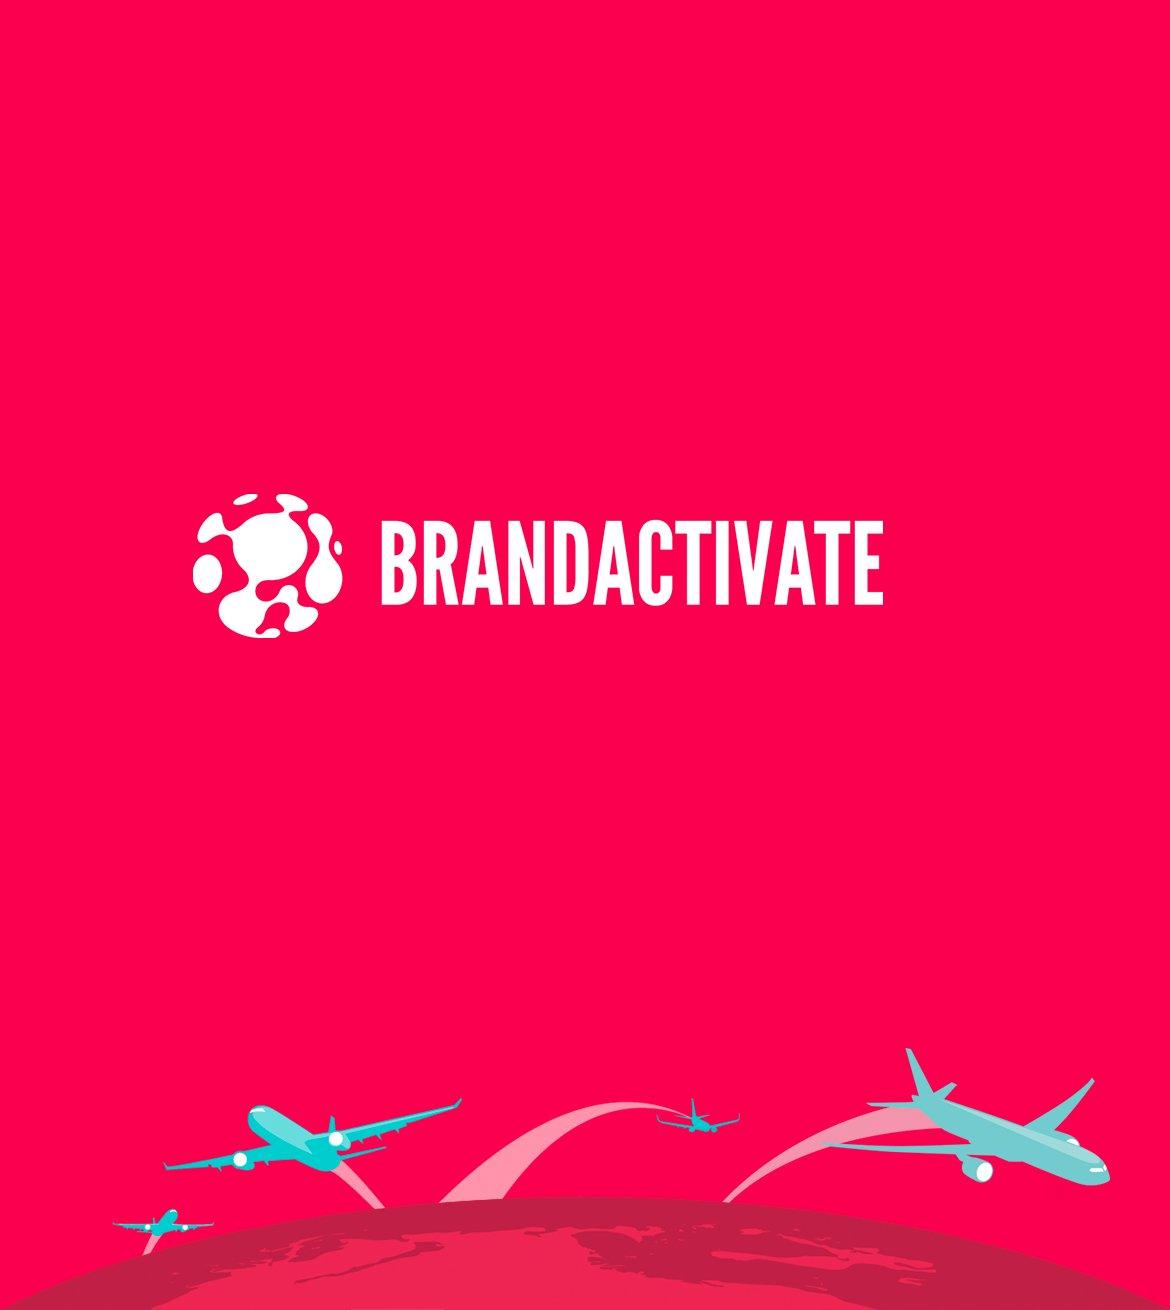 BrandActivate